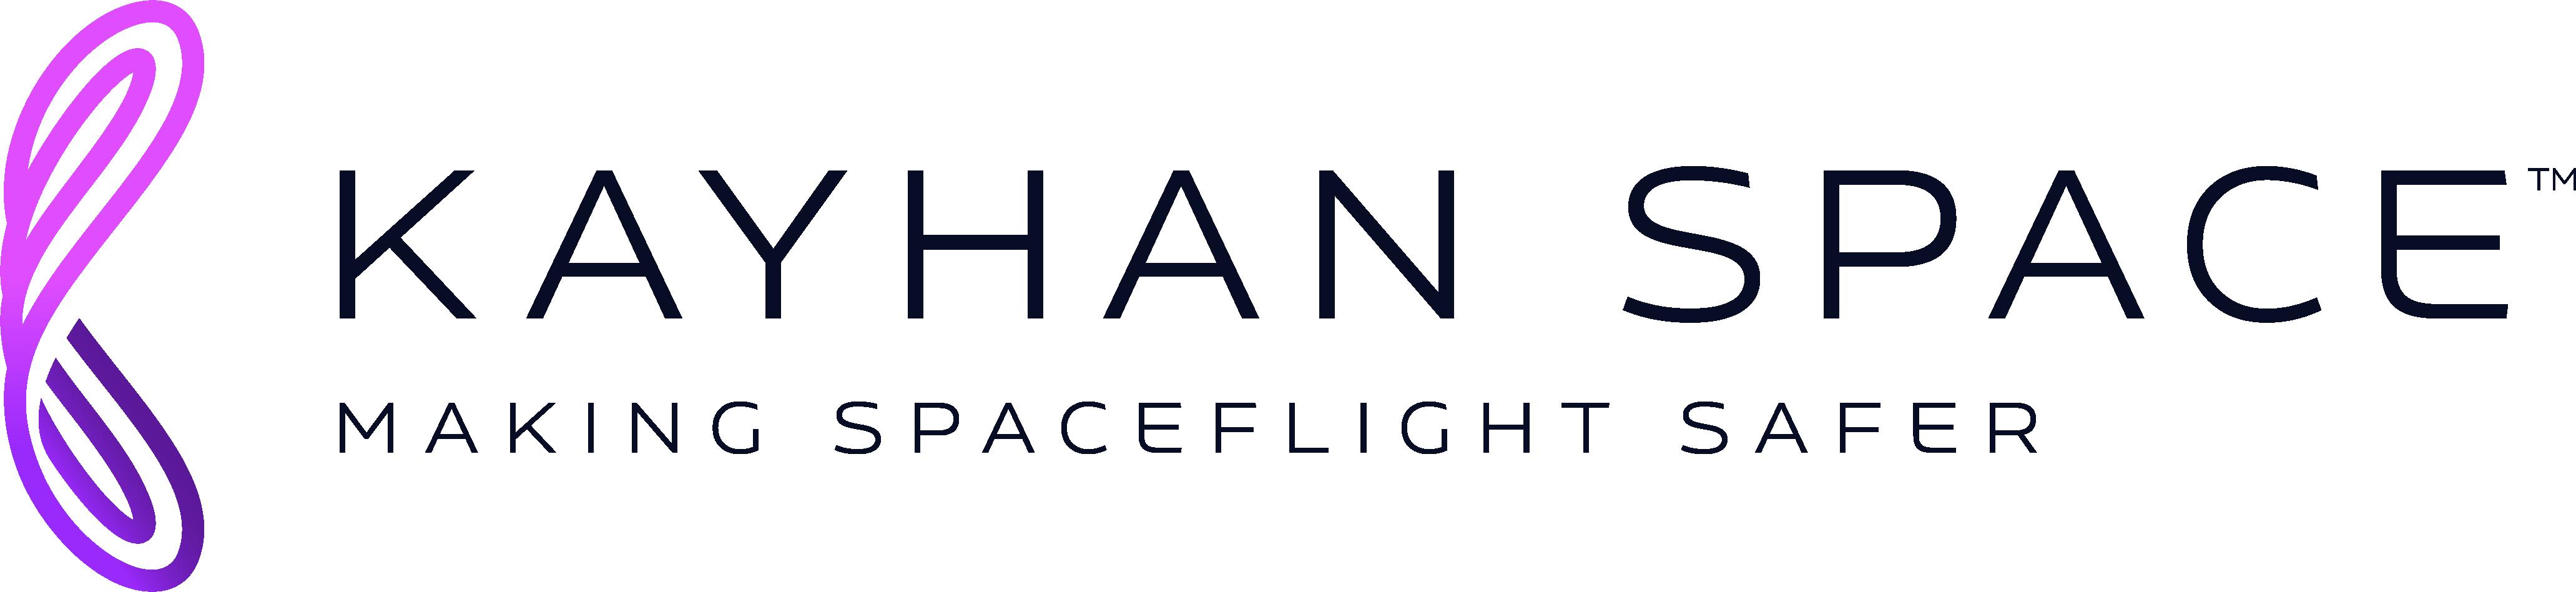 Kayhan Space